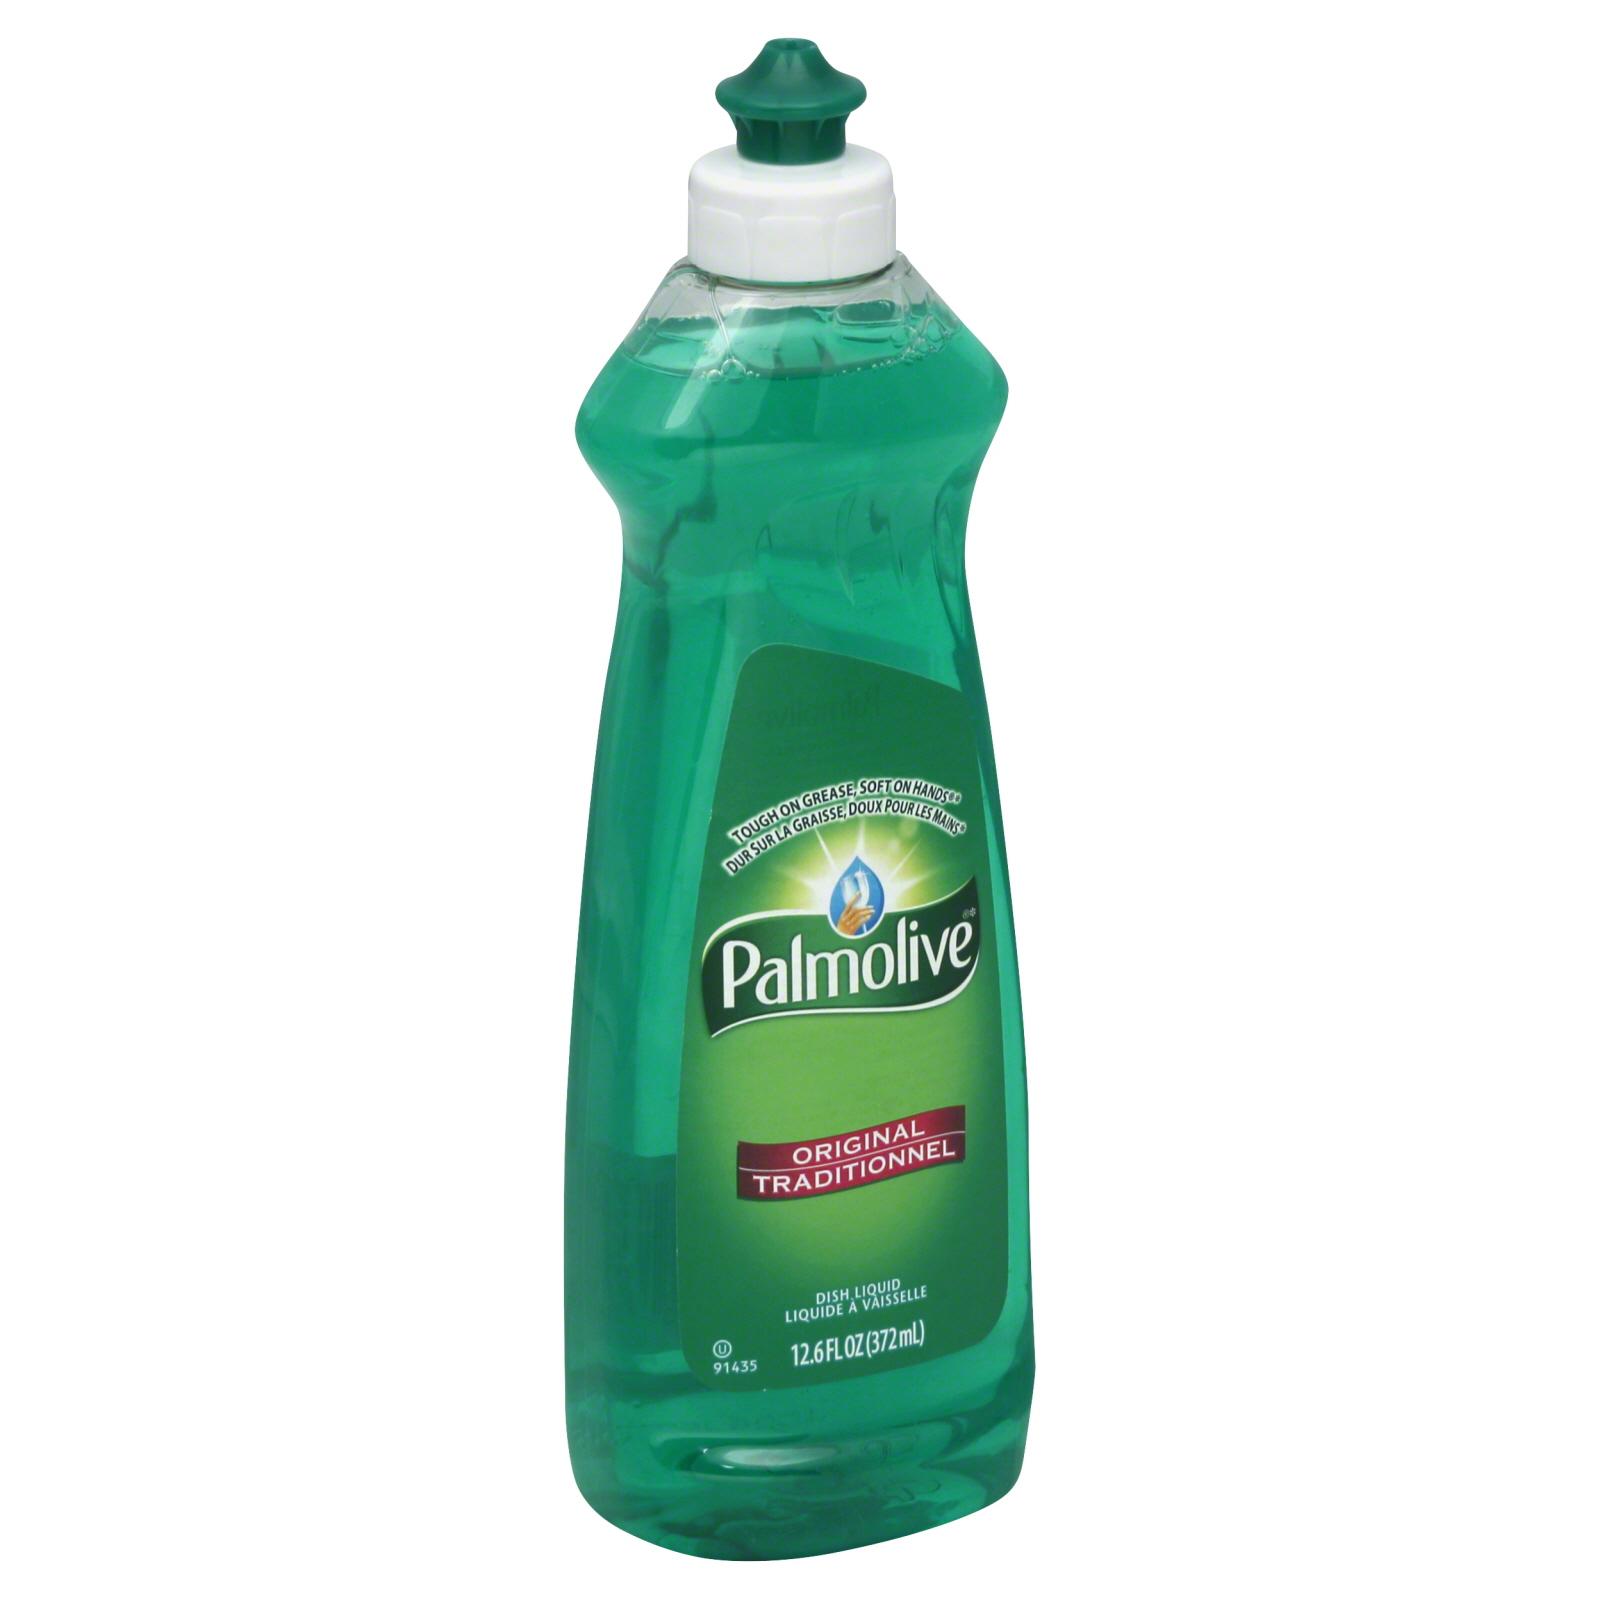 Palmolive Dish Liquid Original 126 Fl Oz 372 Ml